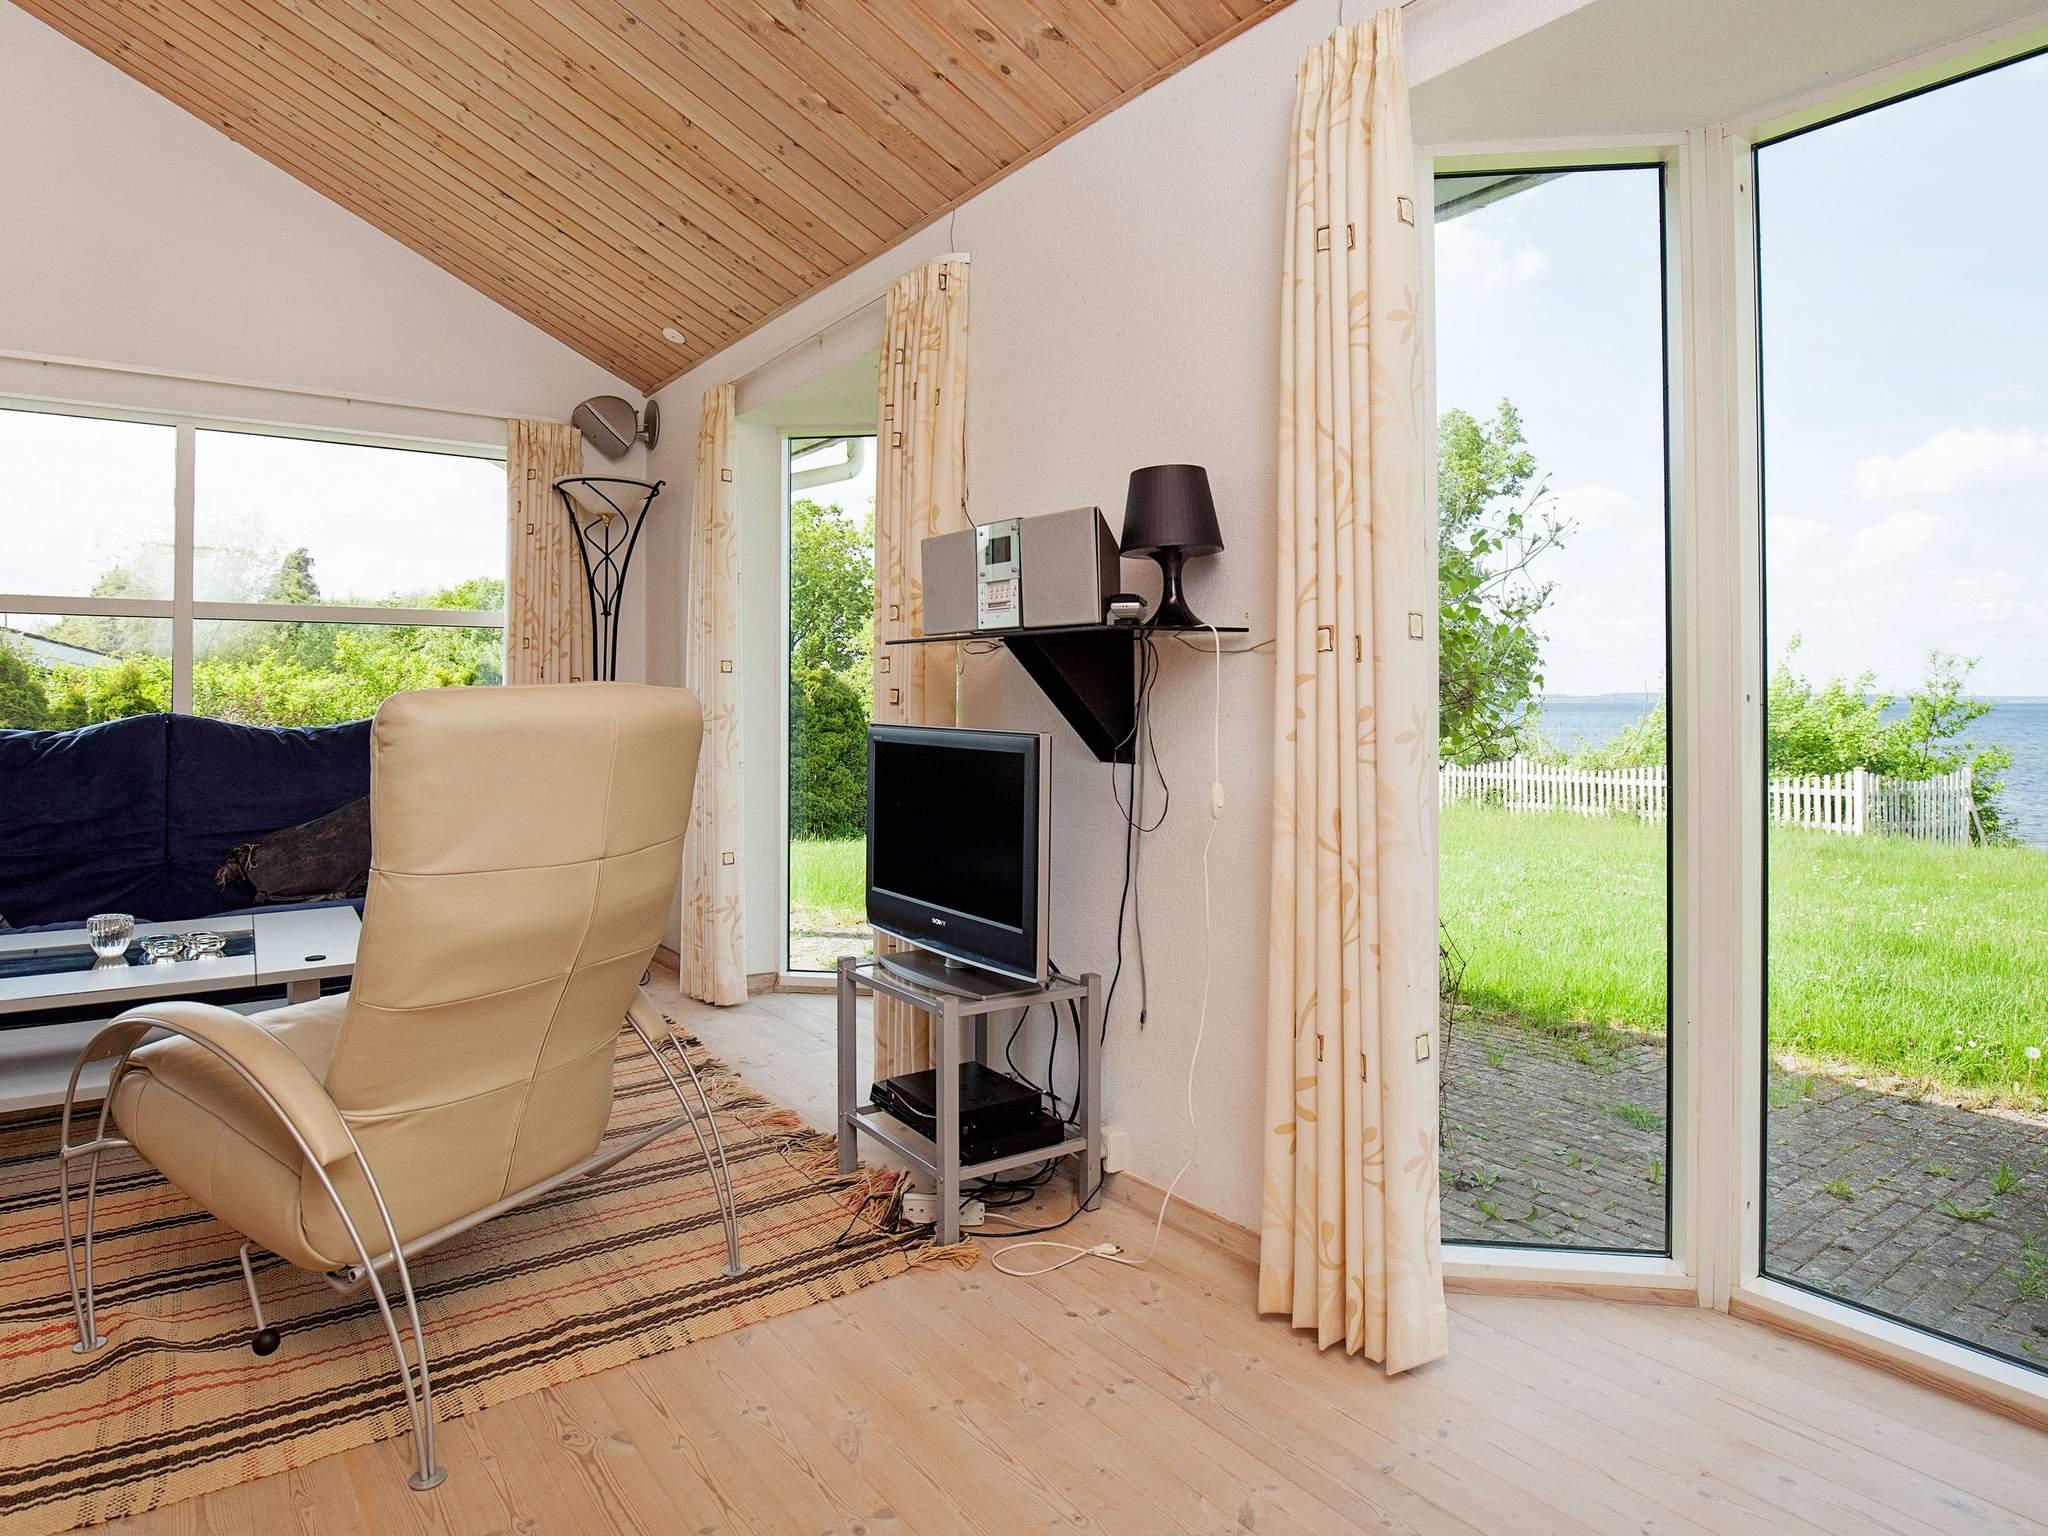 Ferienhaus Præstø (135449), Præstø, , Südseeland, Dänemark, Bild 17